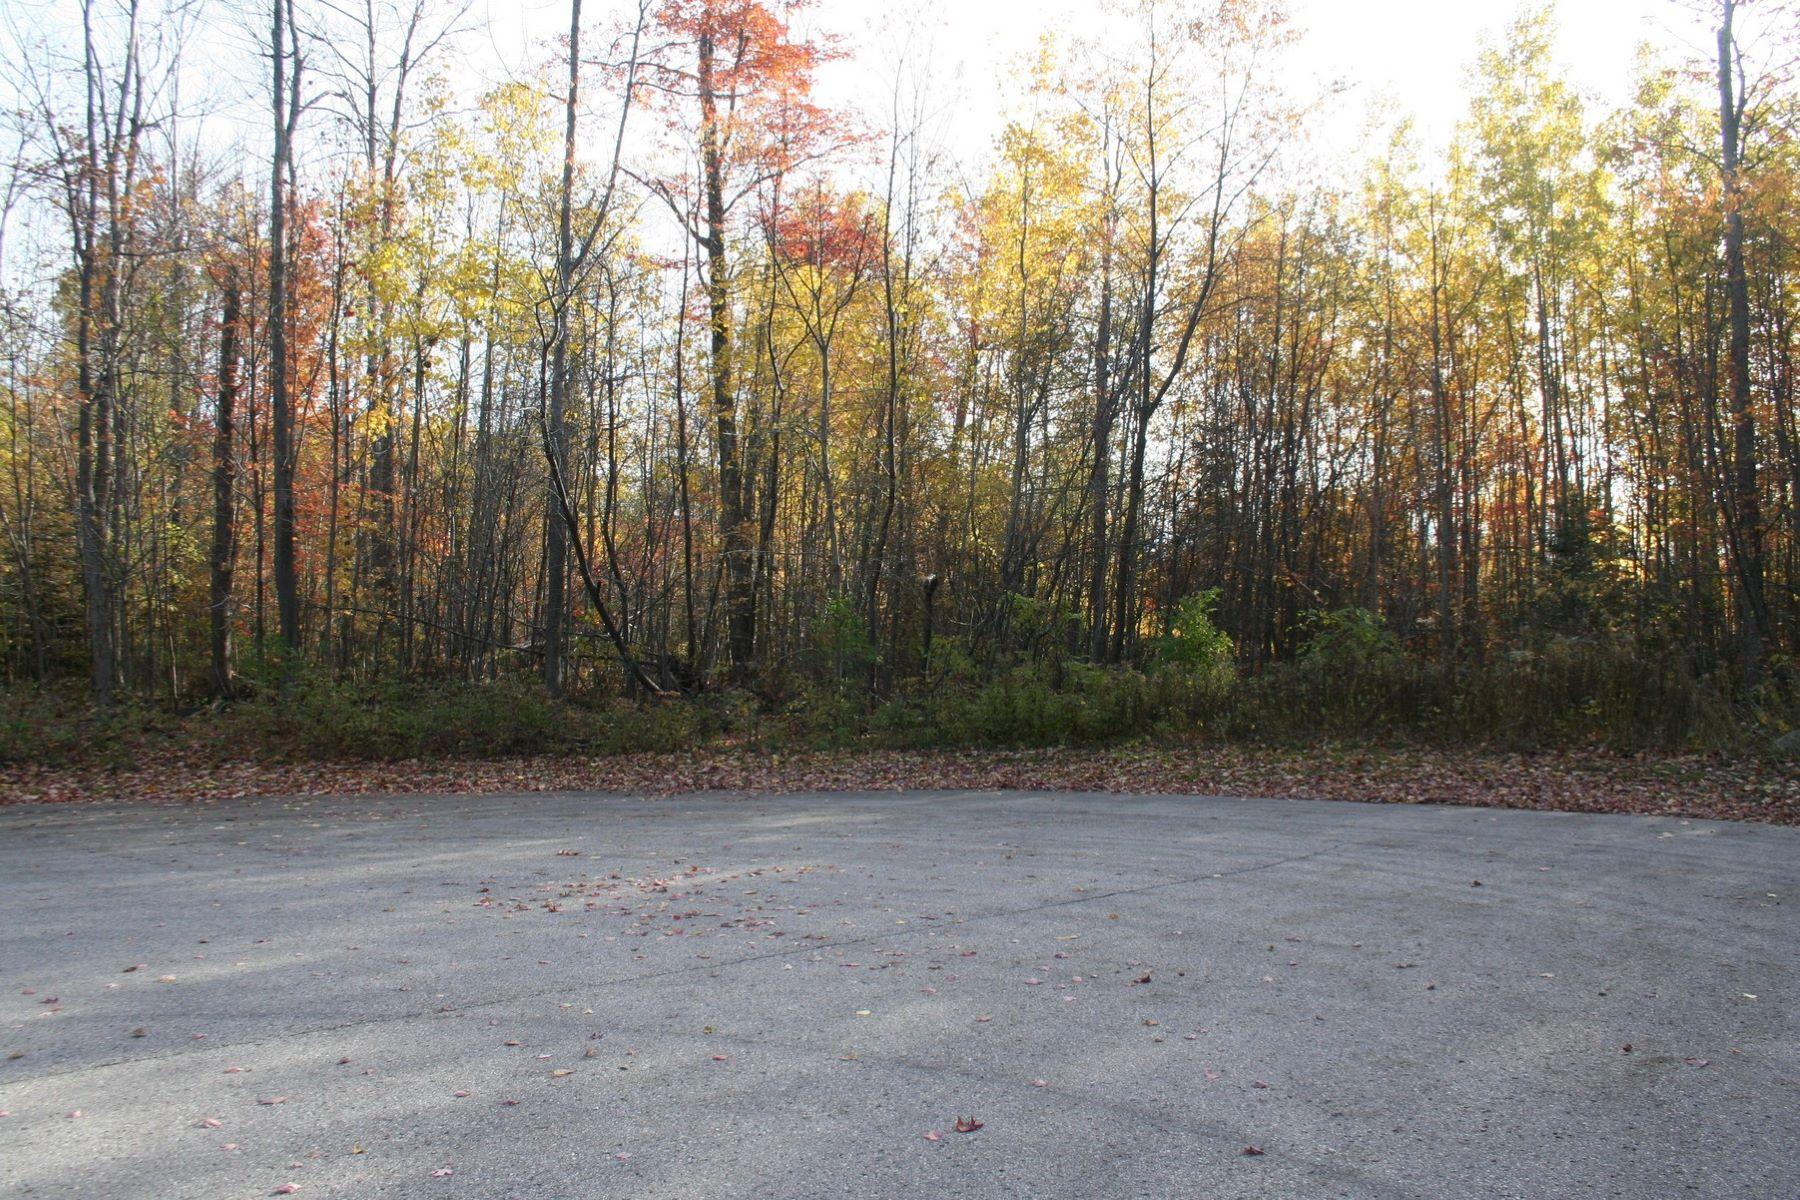 Additional photo for property listing at Coastal Cliffs 15 6173 Coastal Cliffs Bay Harbor, Michigan 49770 United States